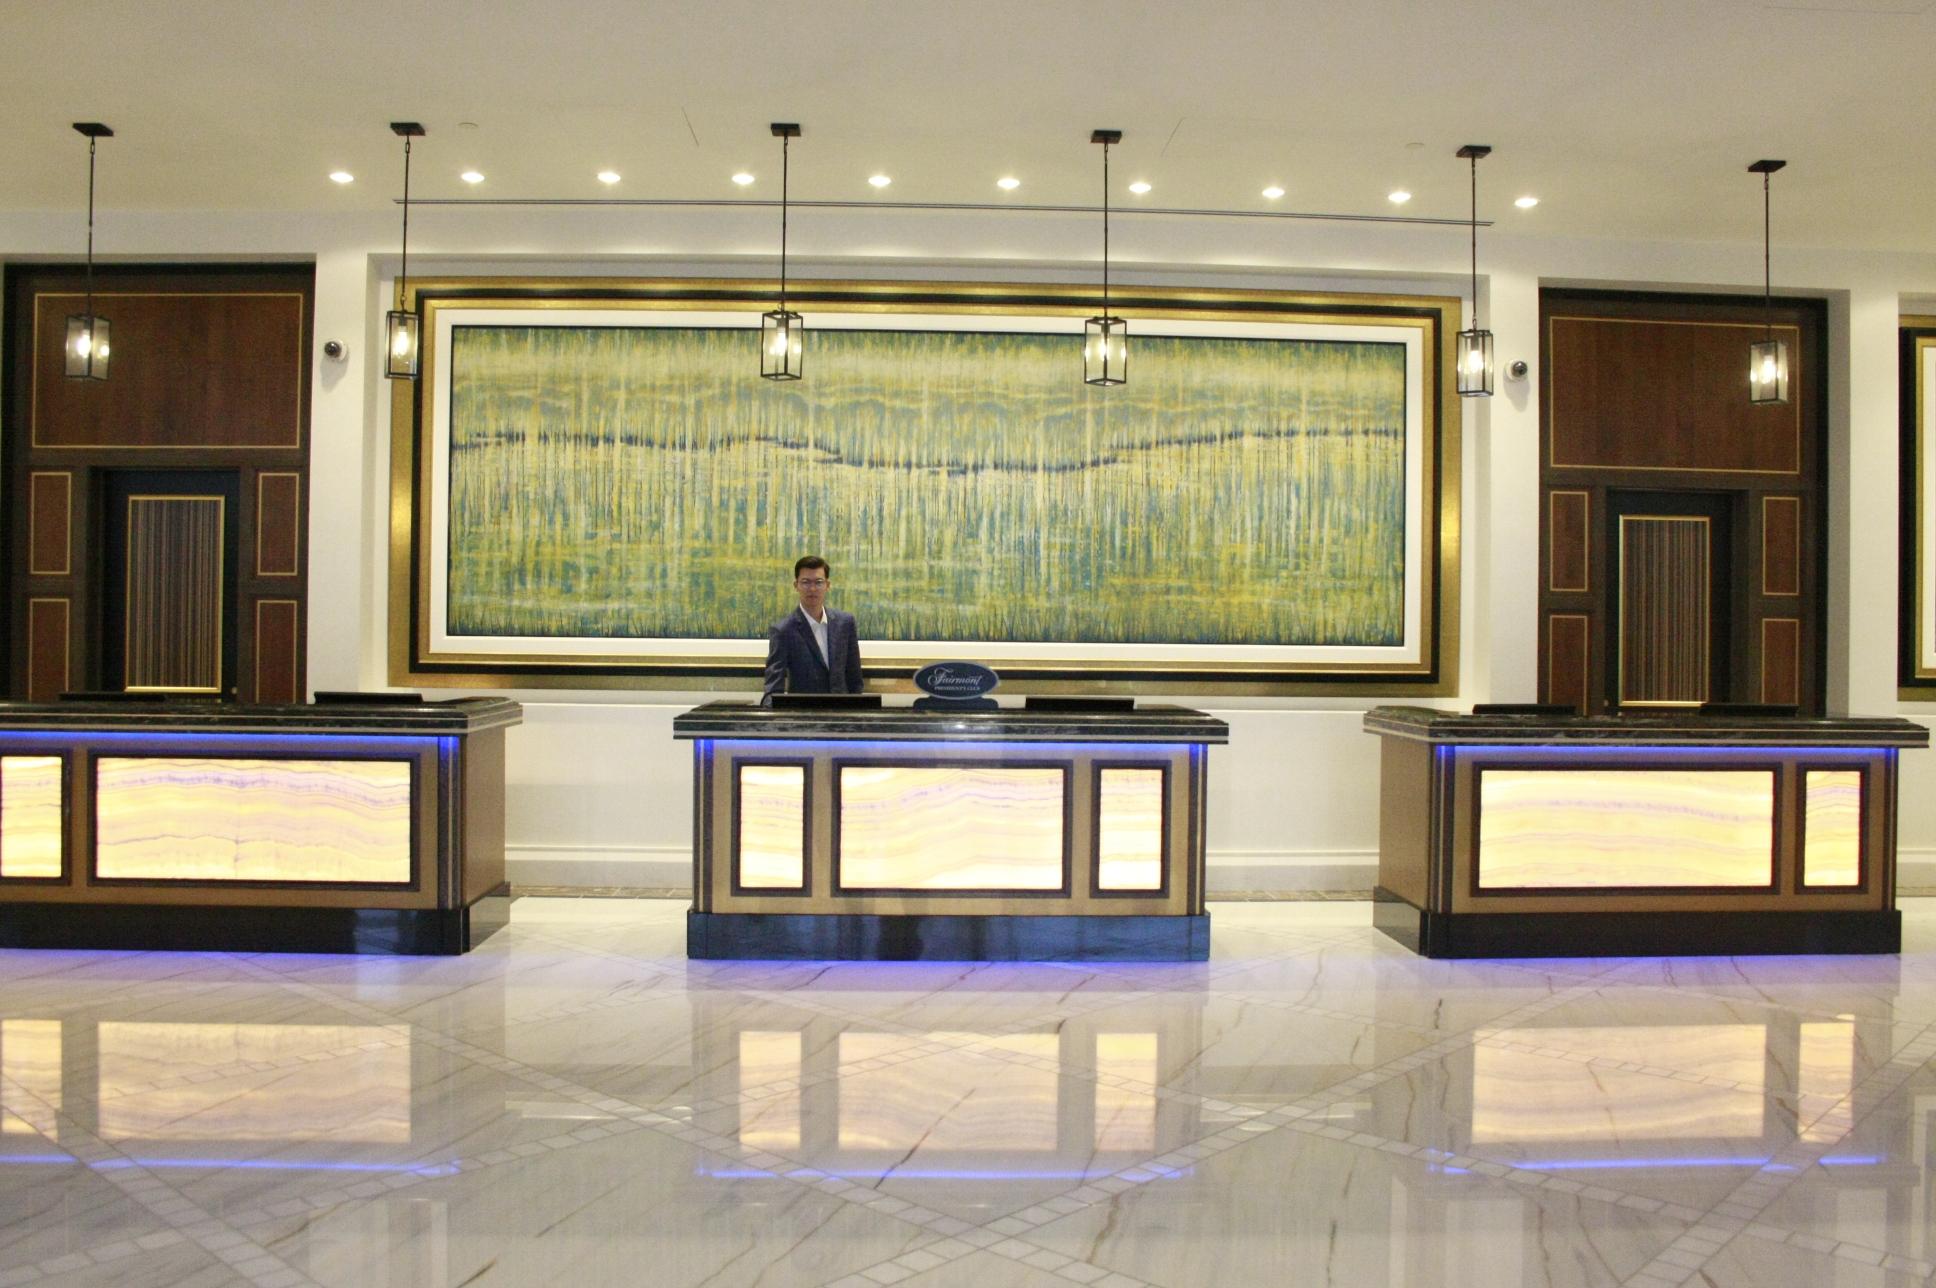 Fairmont Hotel, Austin. Texas